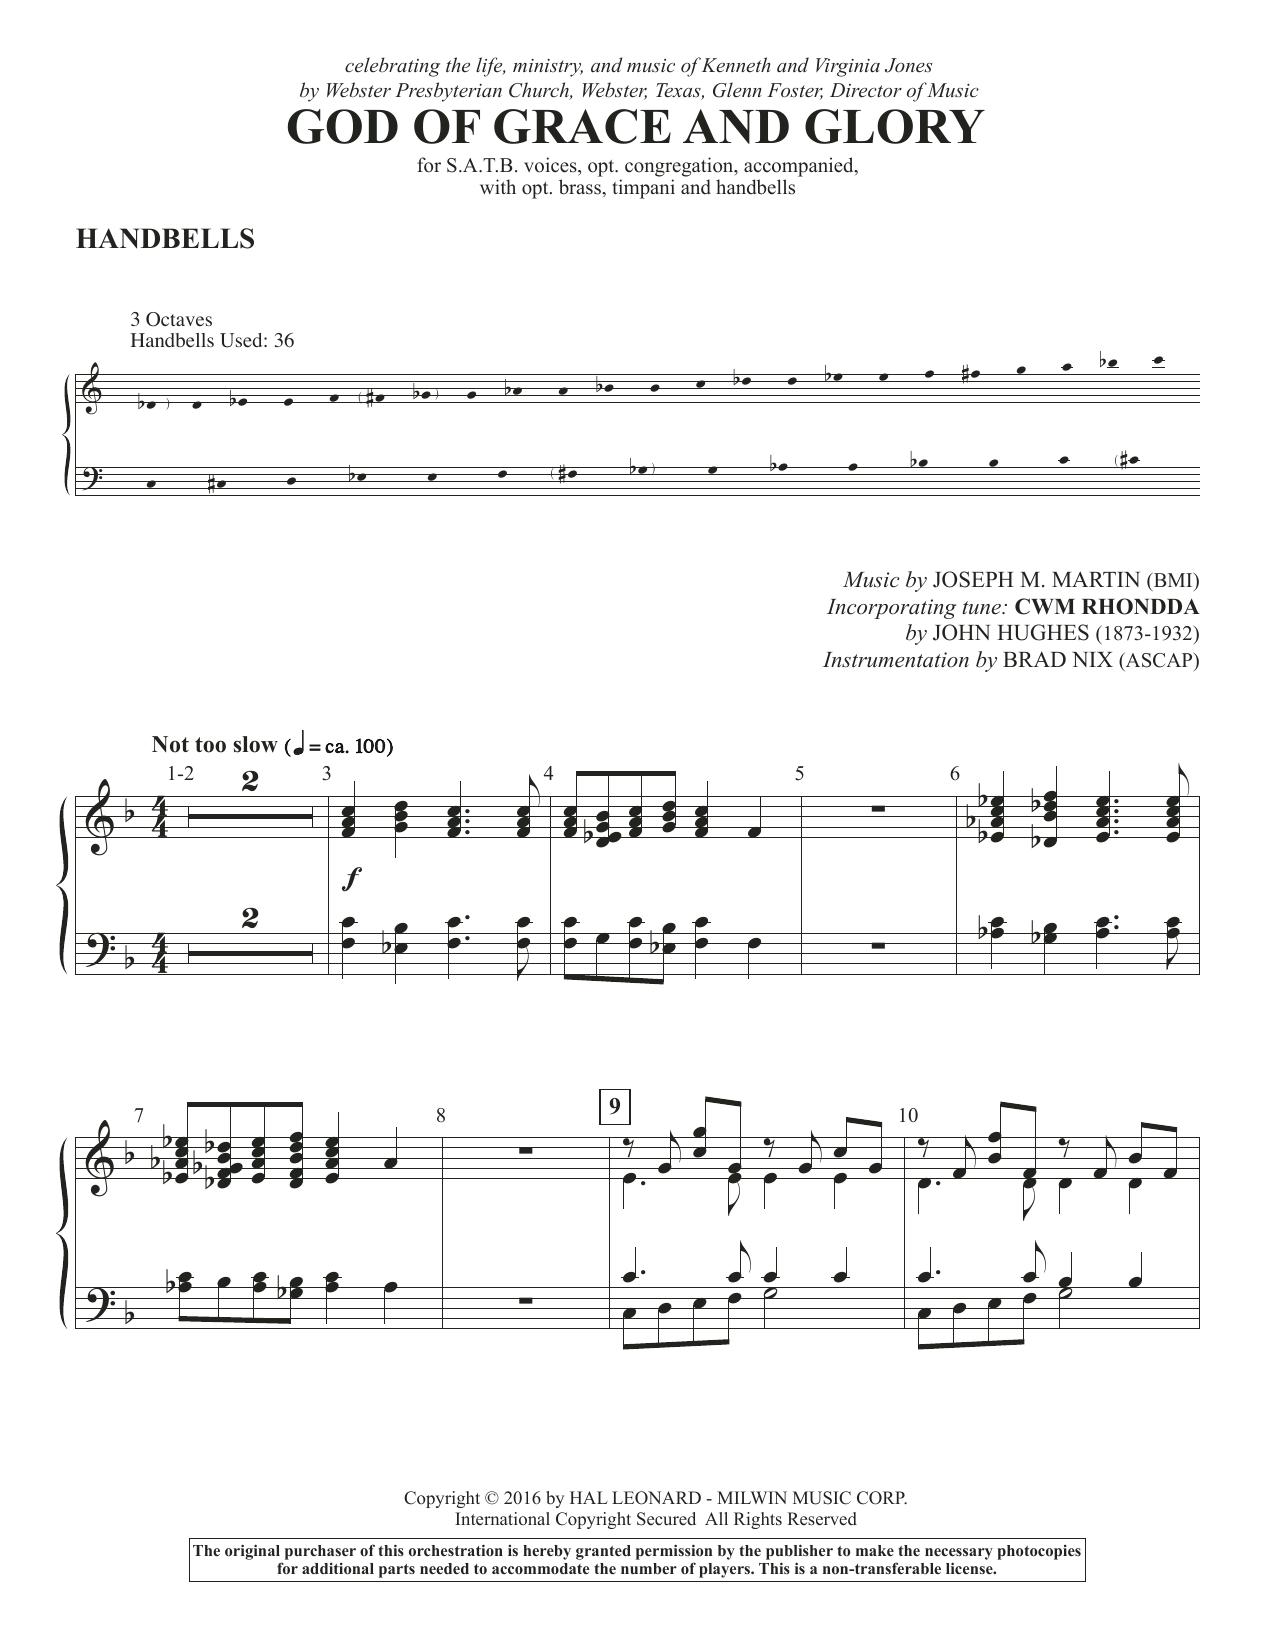 God of Grace and Glory - Handbells Sheet Music